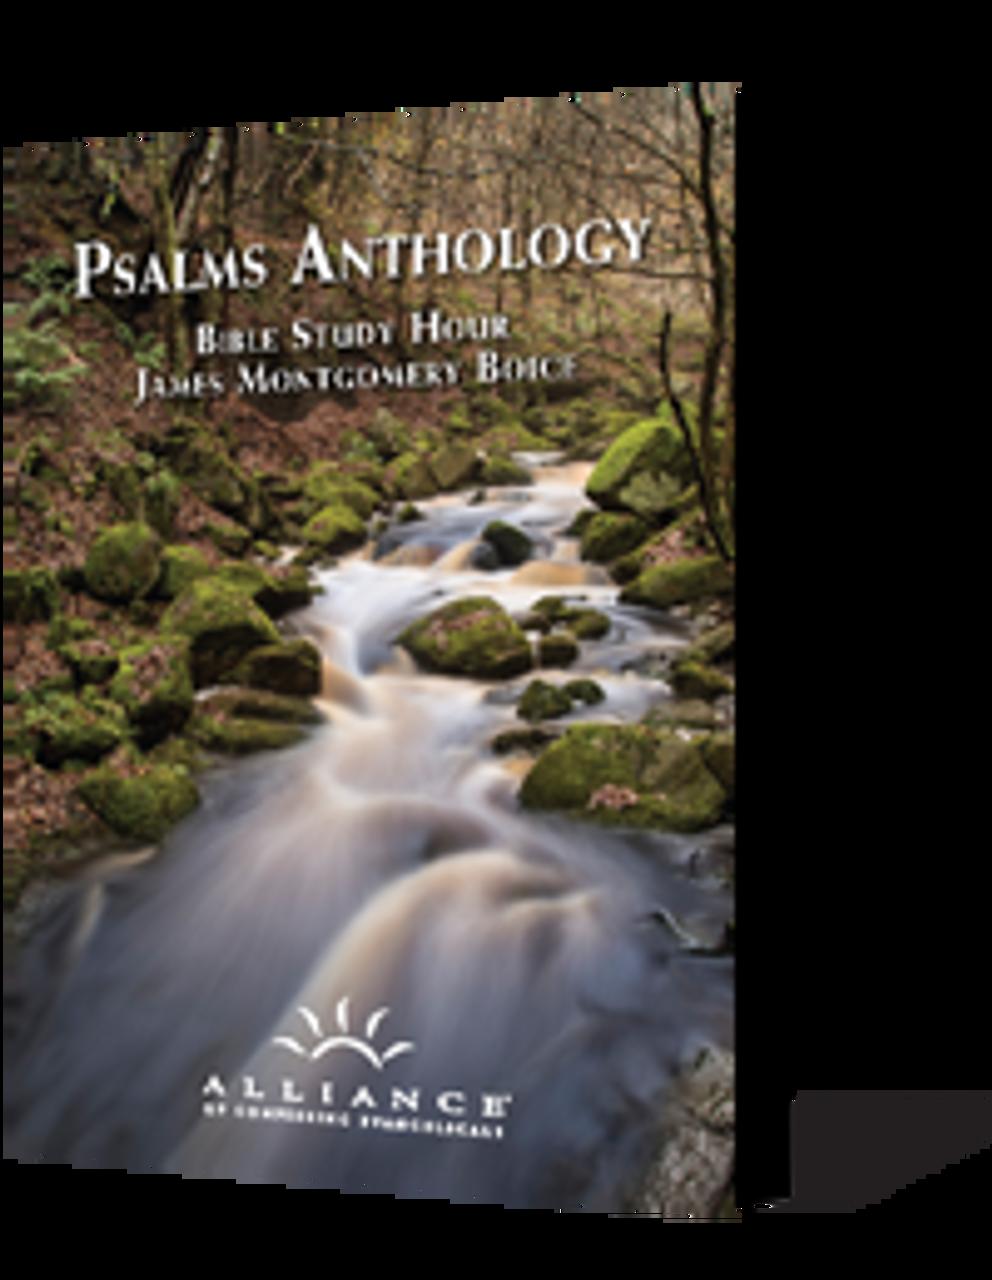 An Evening Psalm (mp3 download)